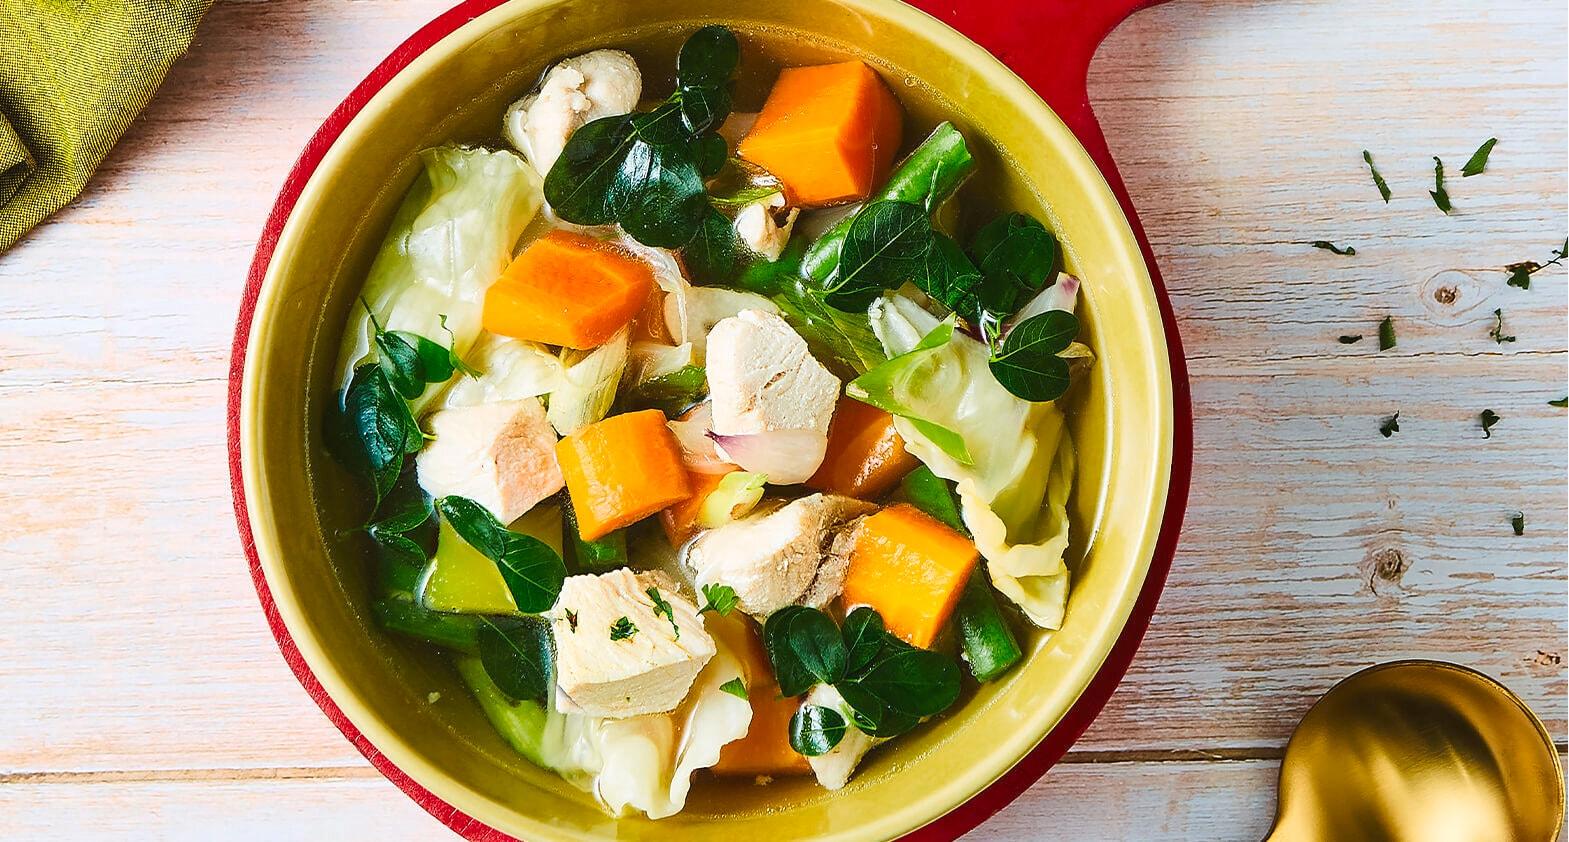 Semangkuk sup ayam daun kelor disajikan